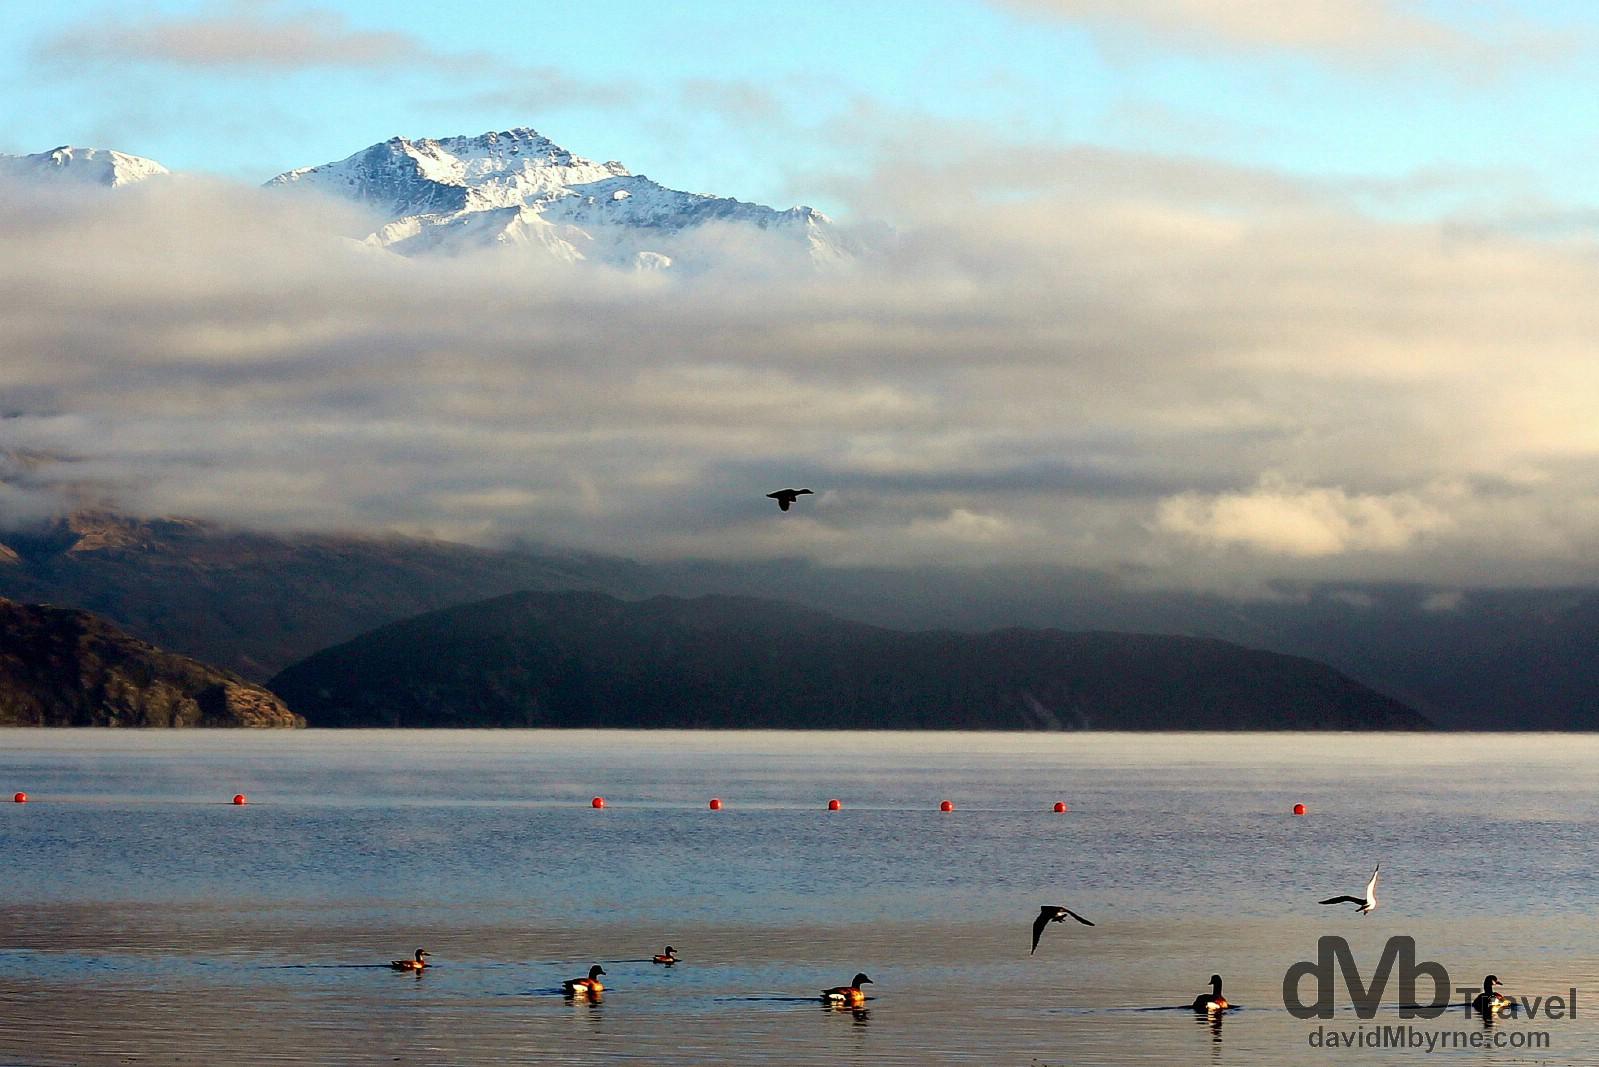 Lake Wanaka, Wanaka, South Island, New Zealand. May 21st 2012.